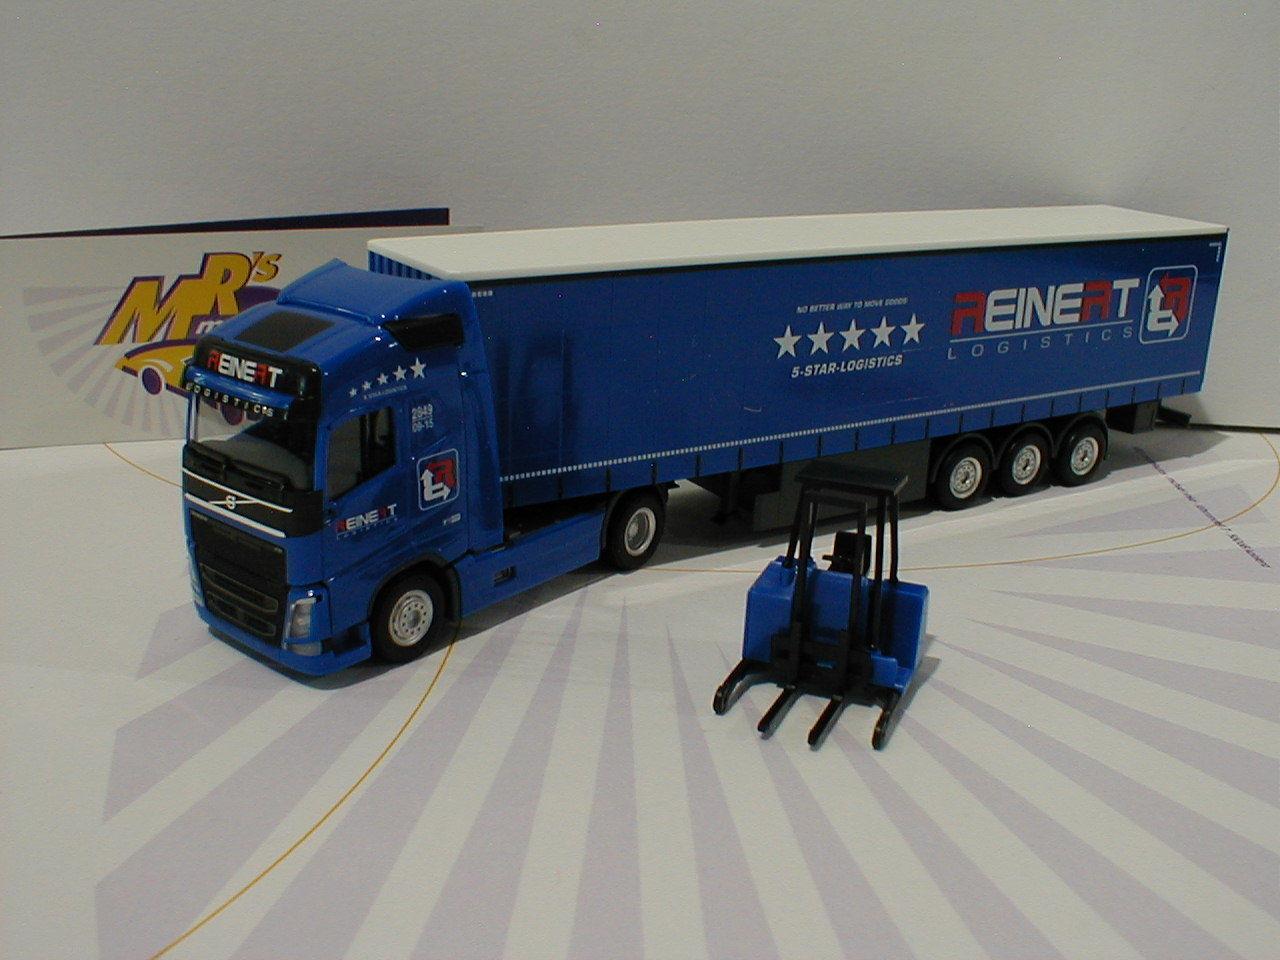 orden en línea Herpa 308465-Volvo FH GL. remolCochese camiones con apilador apilador apilador  Reinert Logistics  1 87  80% de descuento